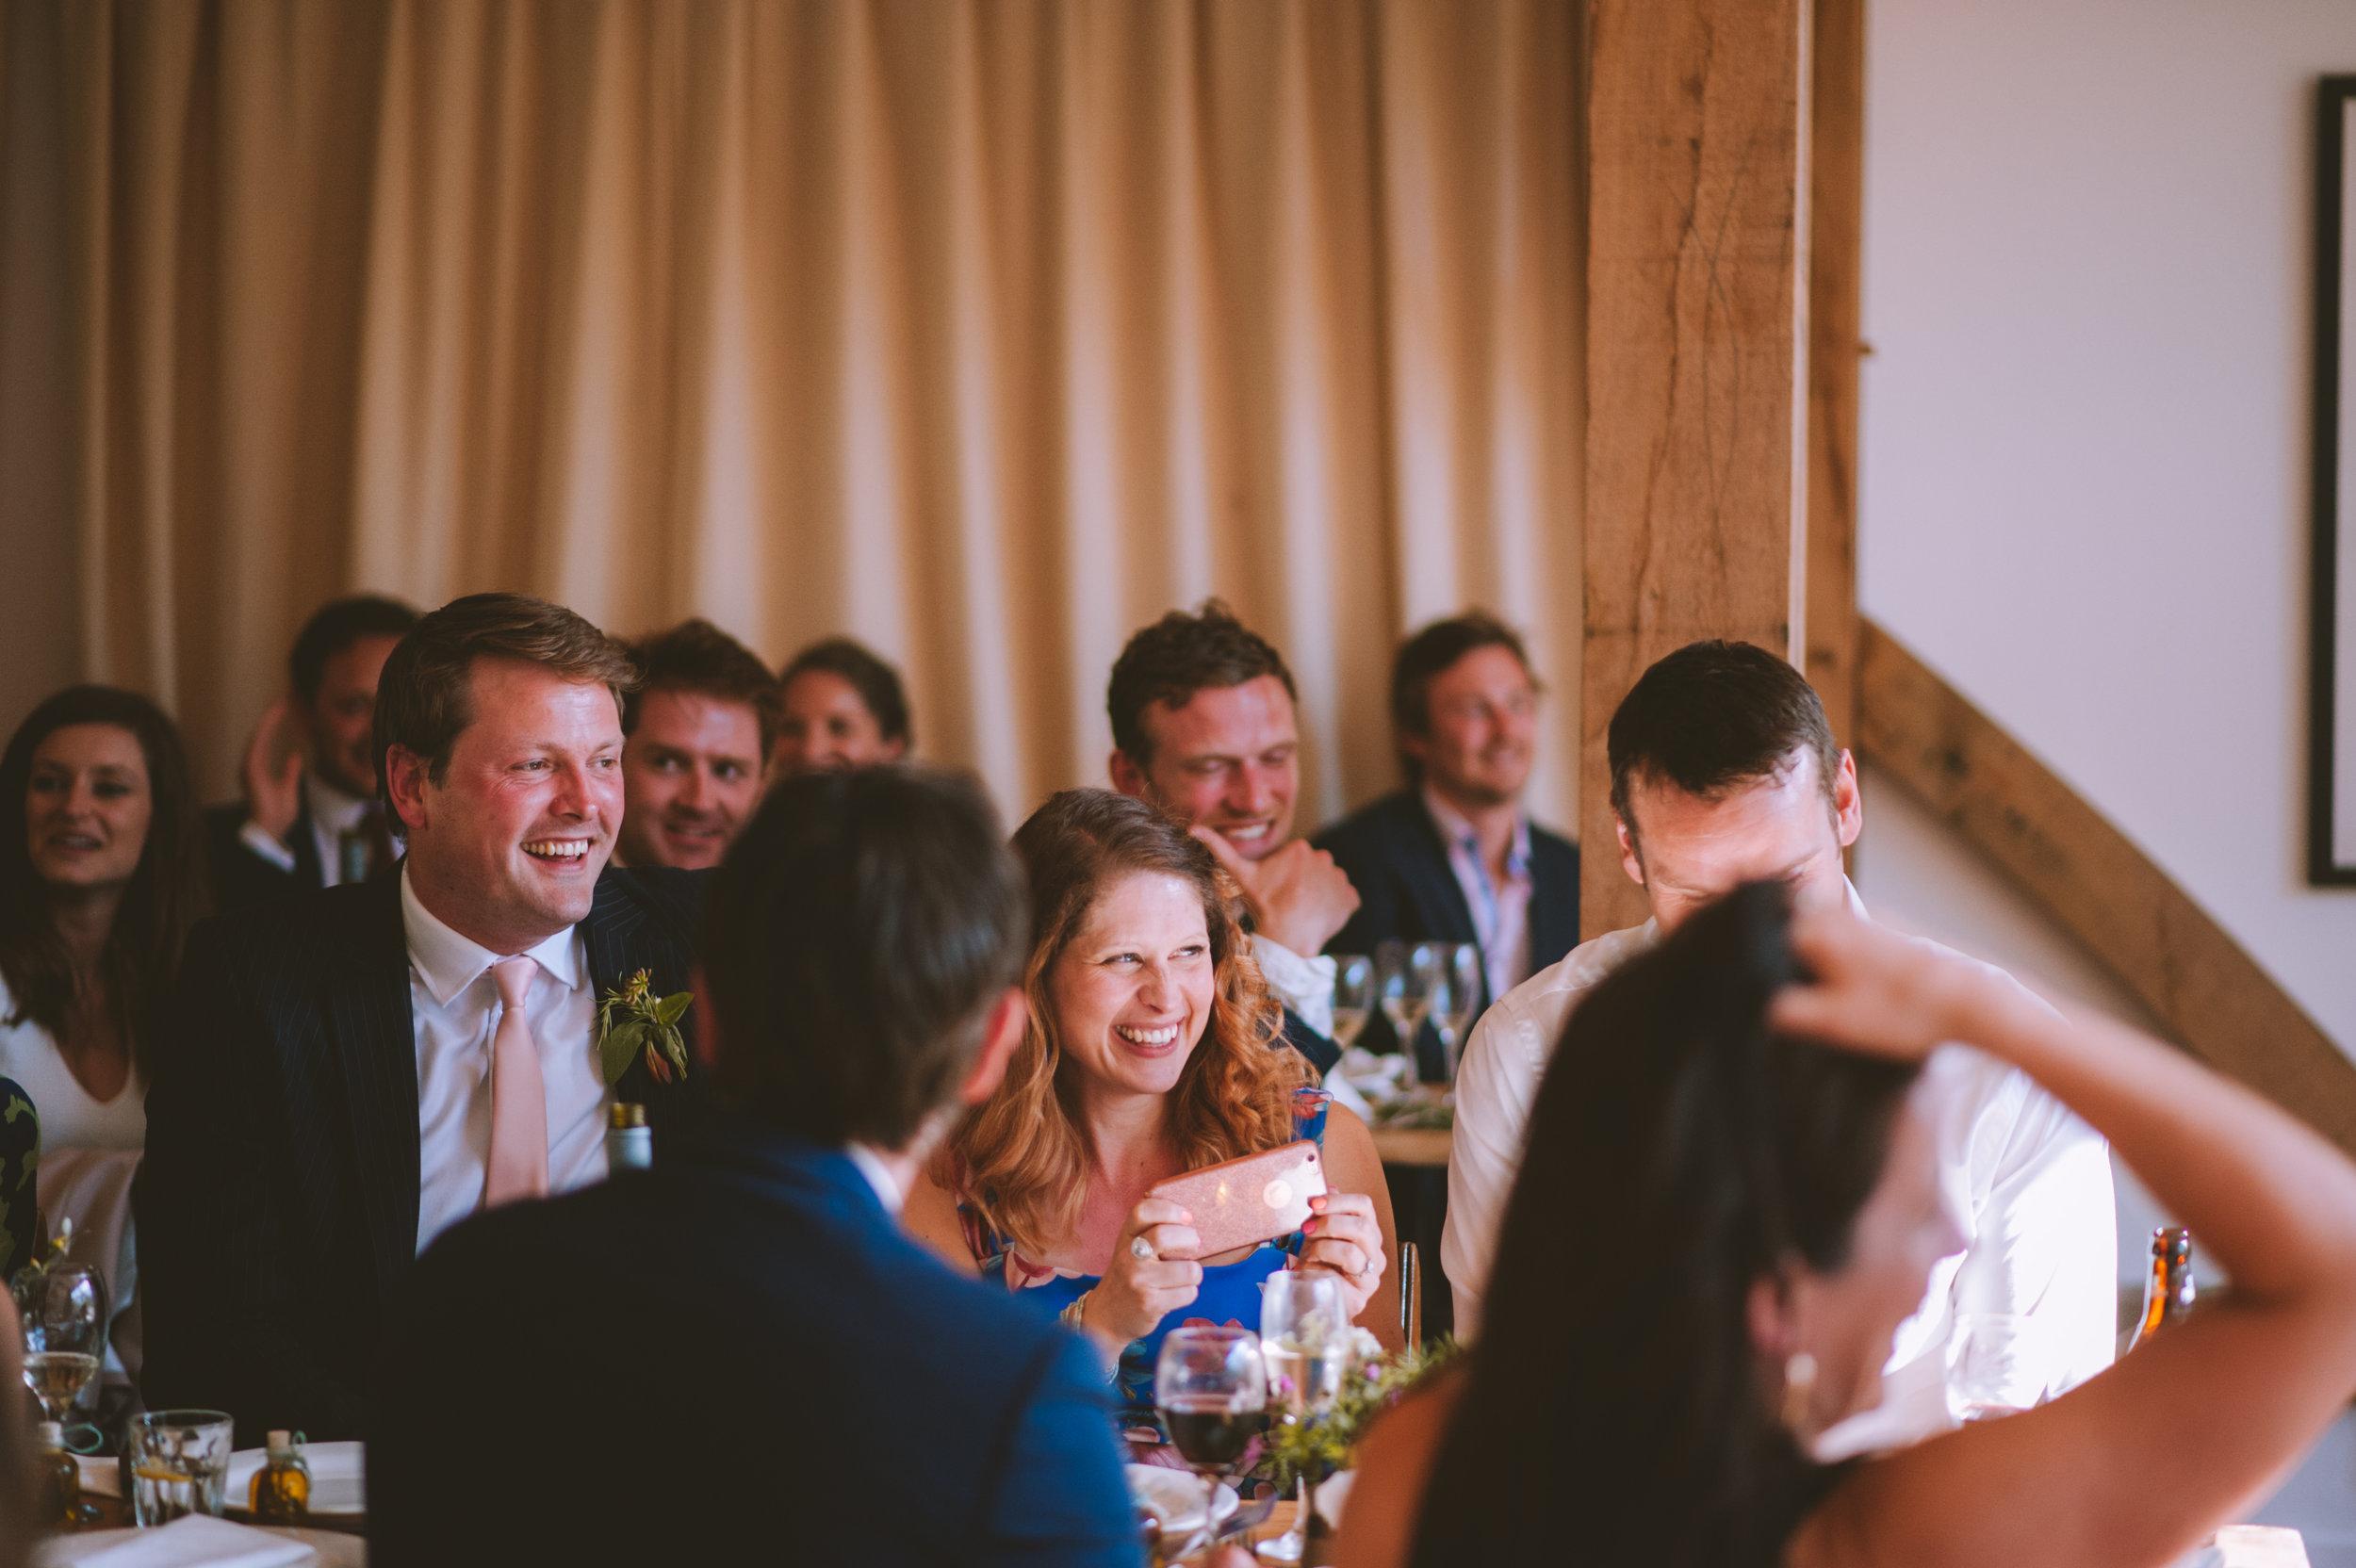 nancarrow-wedding-photography-56.jpg